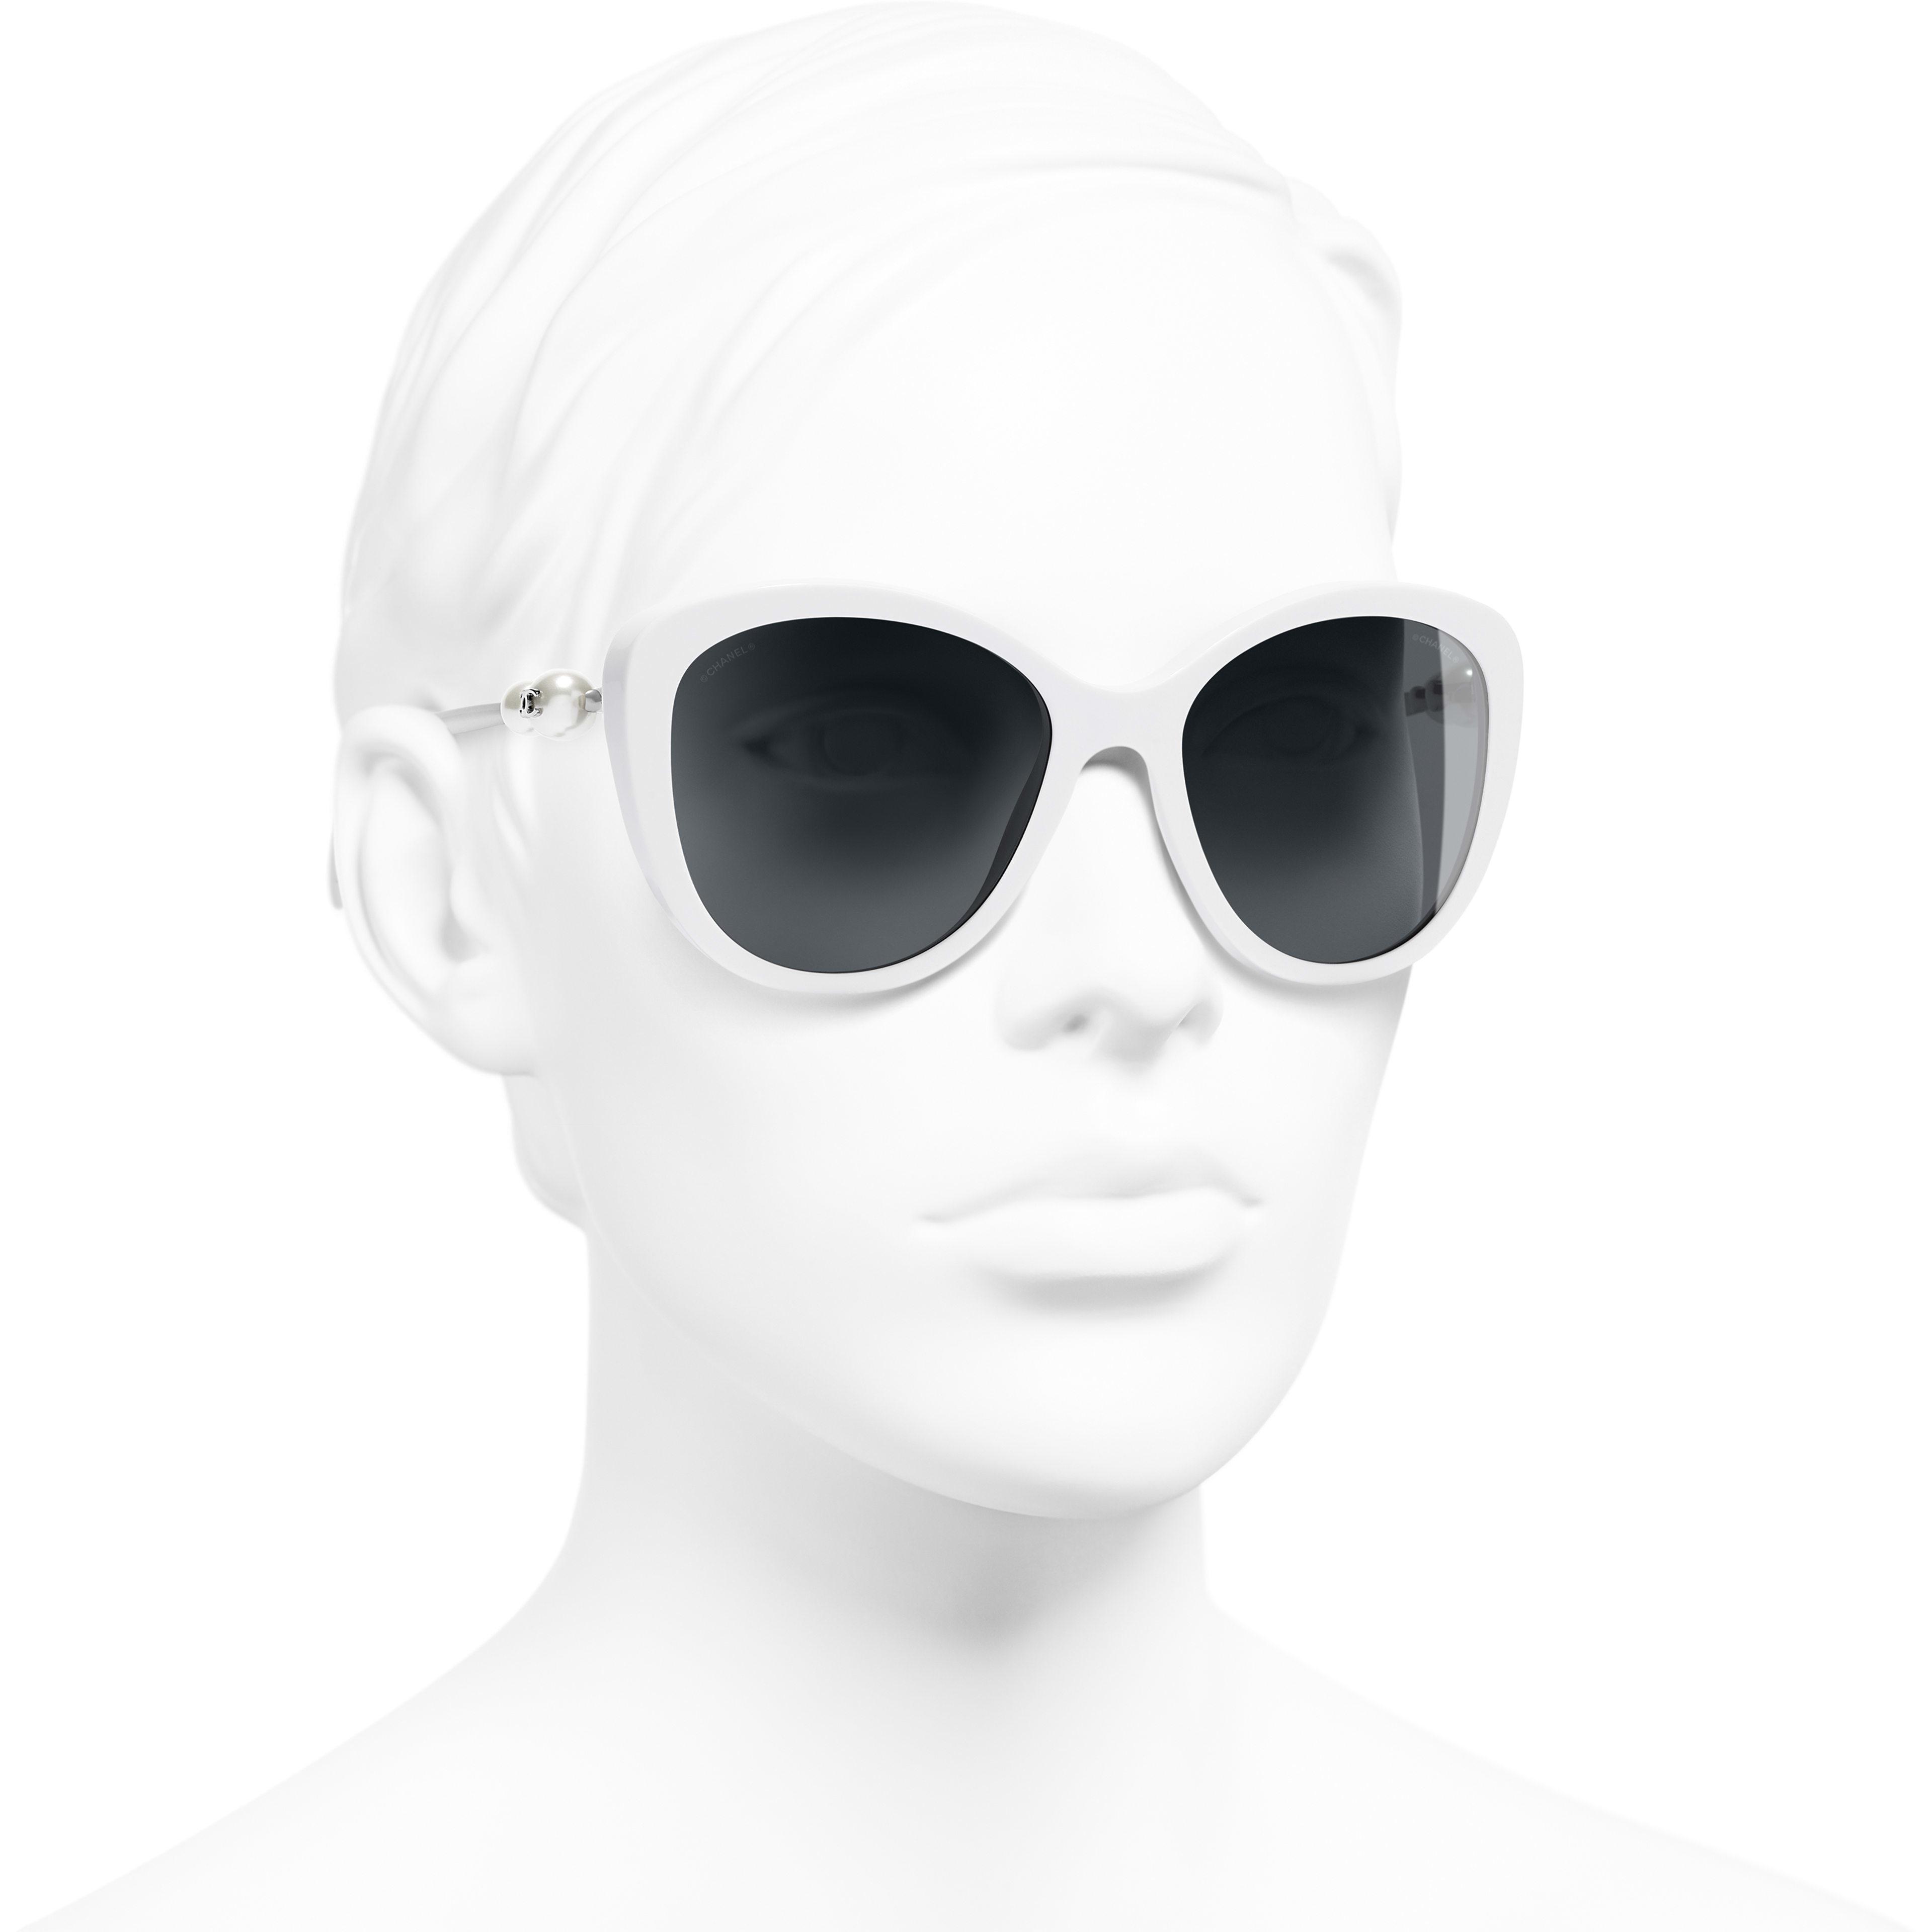 Schmetterlingsförmige Sonnenbrille - Weiß - Azetat & Modeschmuckkperlen - 3/4-Ansicht - Standardgröße anzeigen